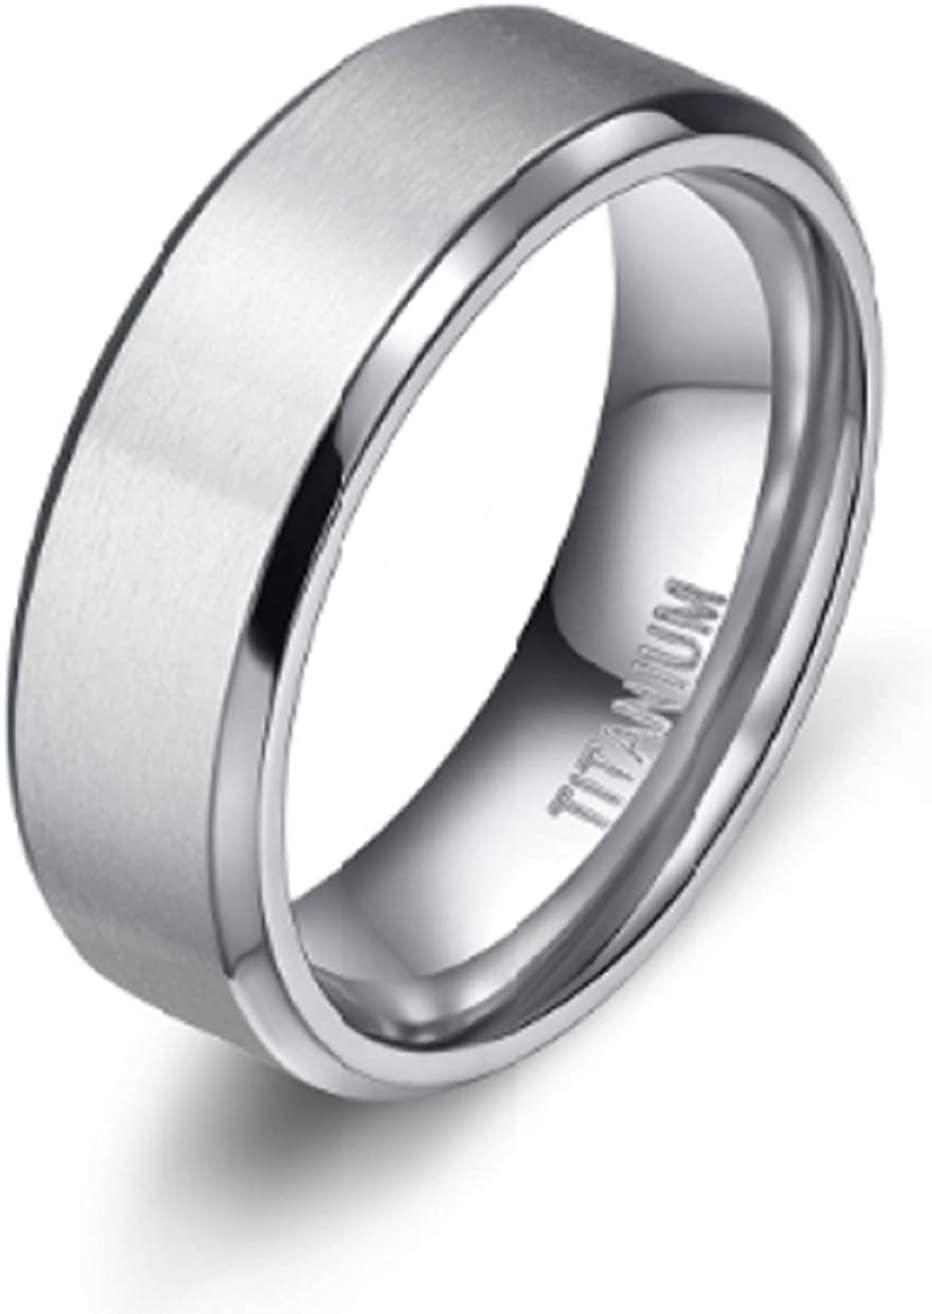 General Metallurgy Classic Beveled Titanium Wedding Band Ring (8mm Thickness)